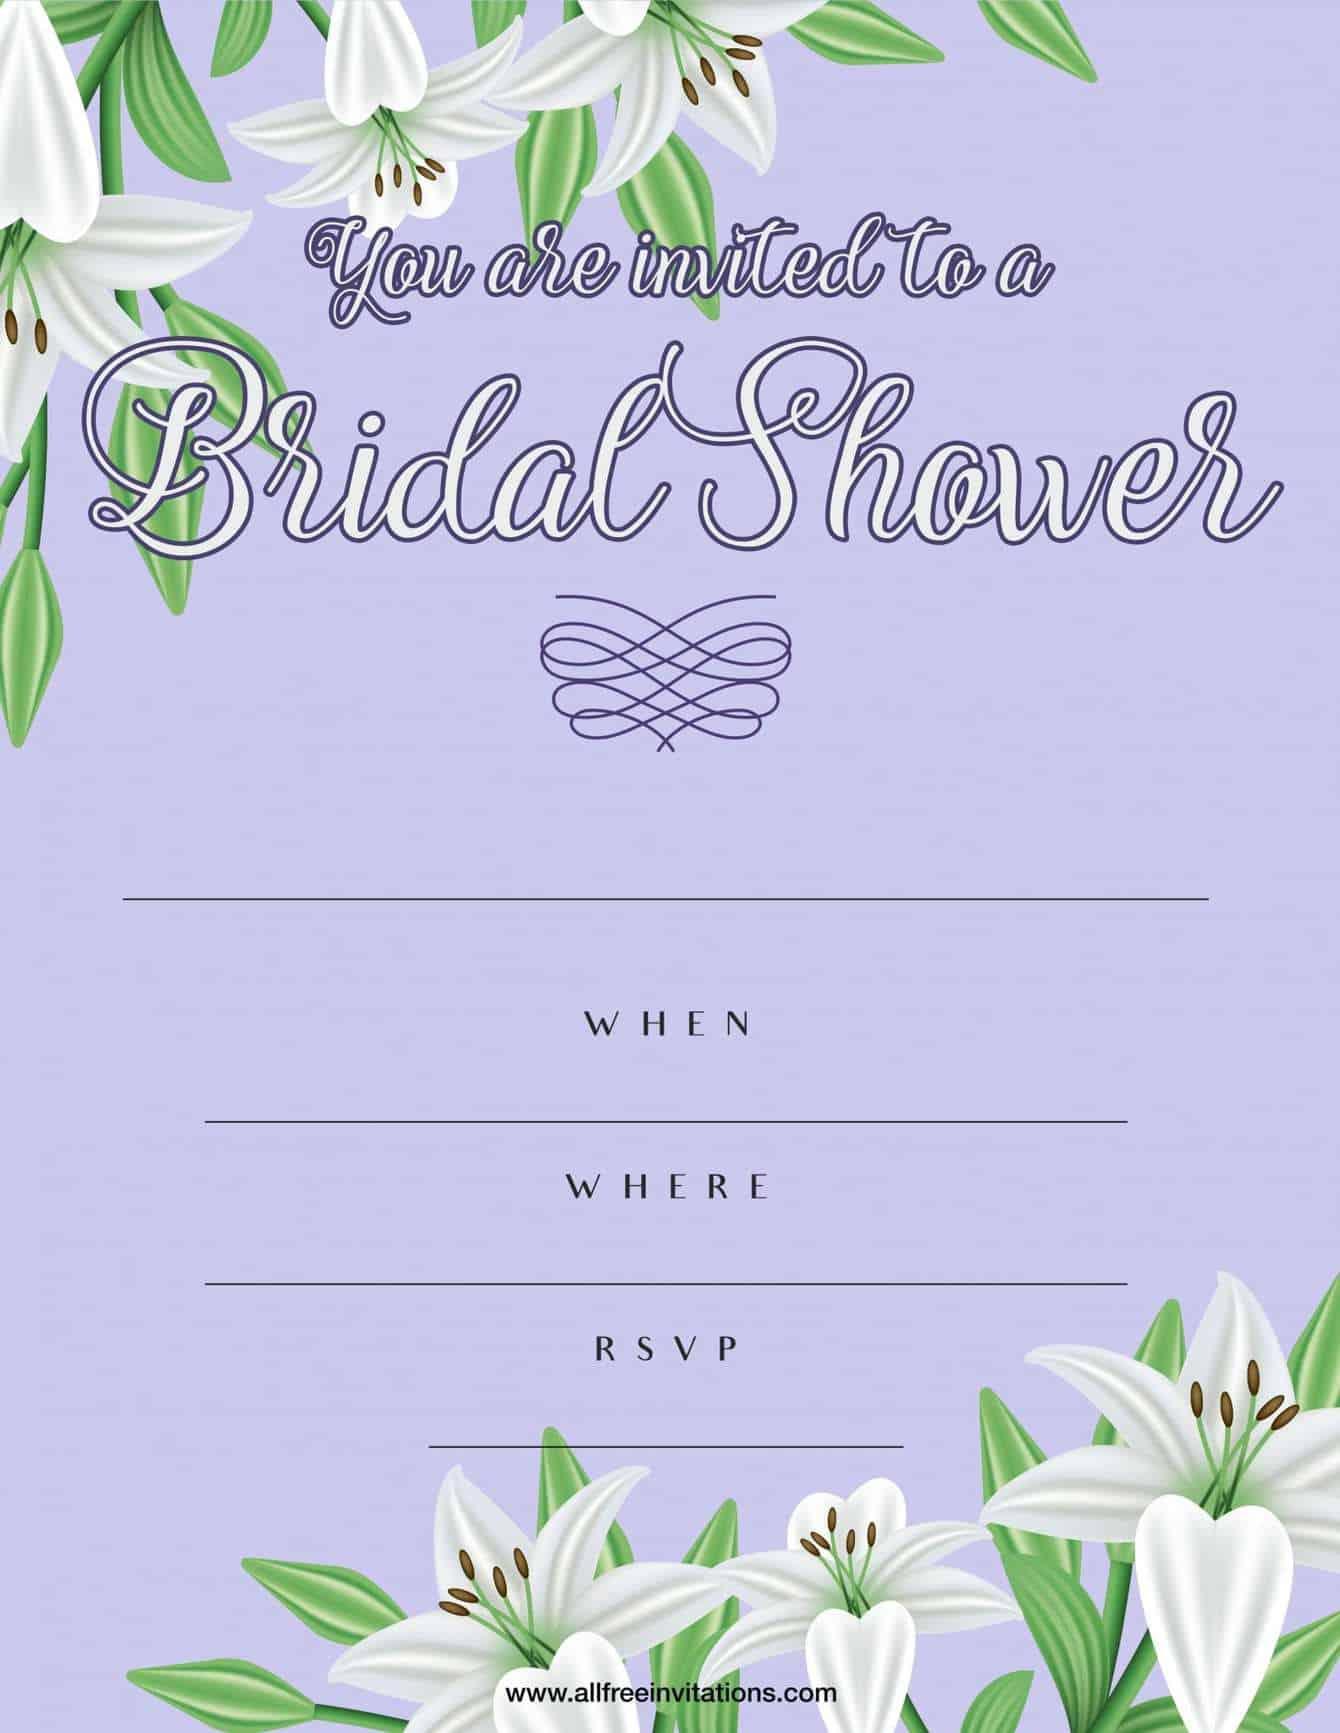 Bridal shower invitation purple and white floral design